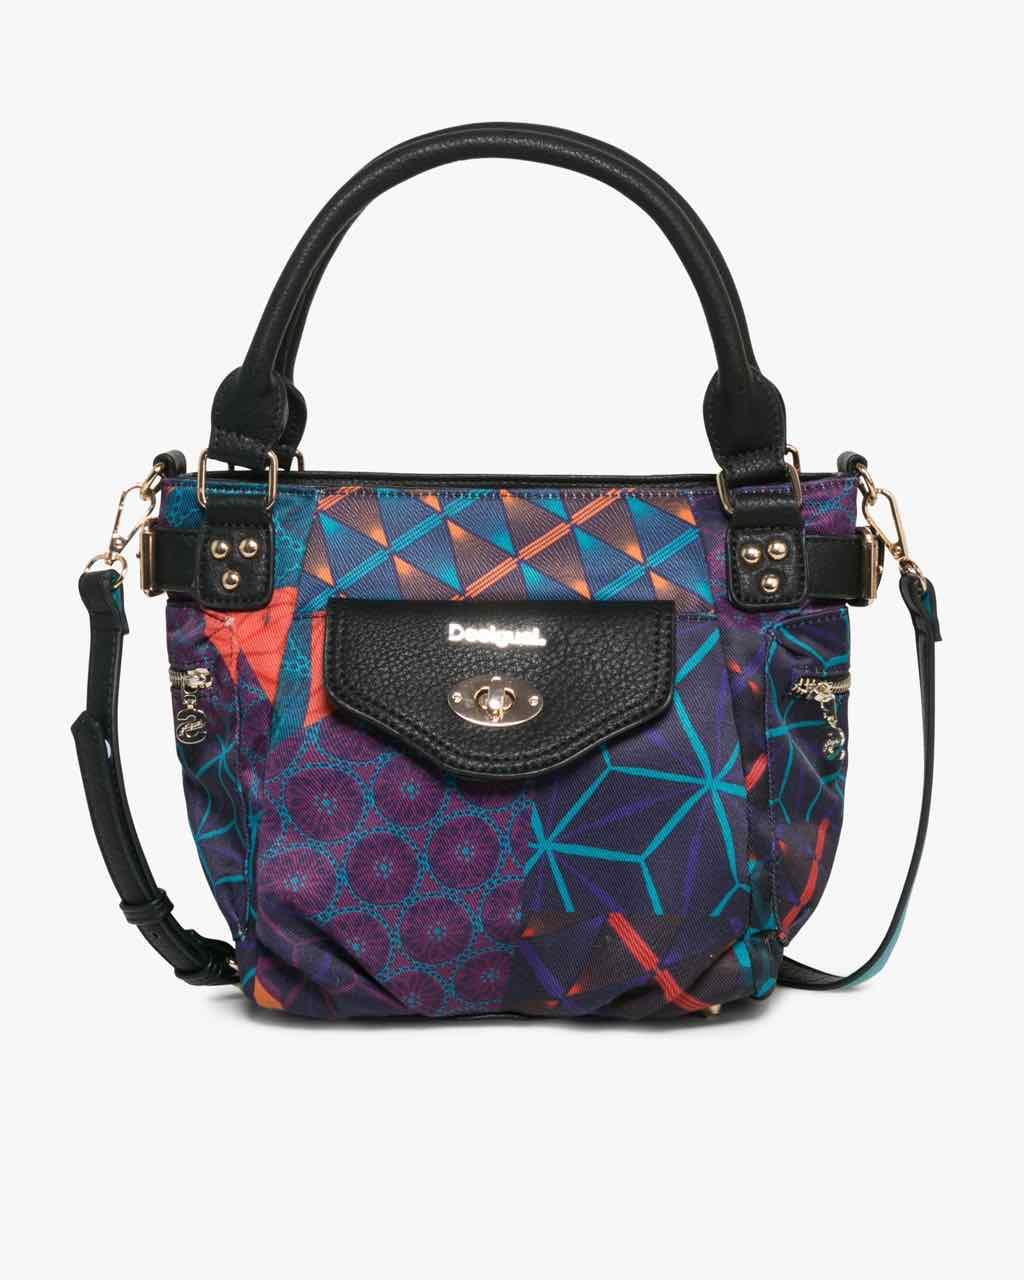 17WAXPA8_3094 Desigual Bag Mcbee Mini Erika Buy Online